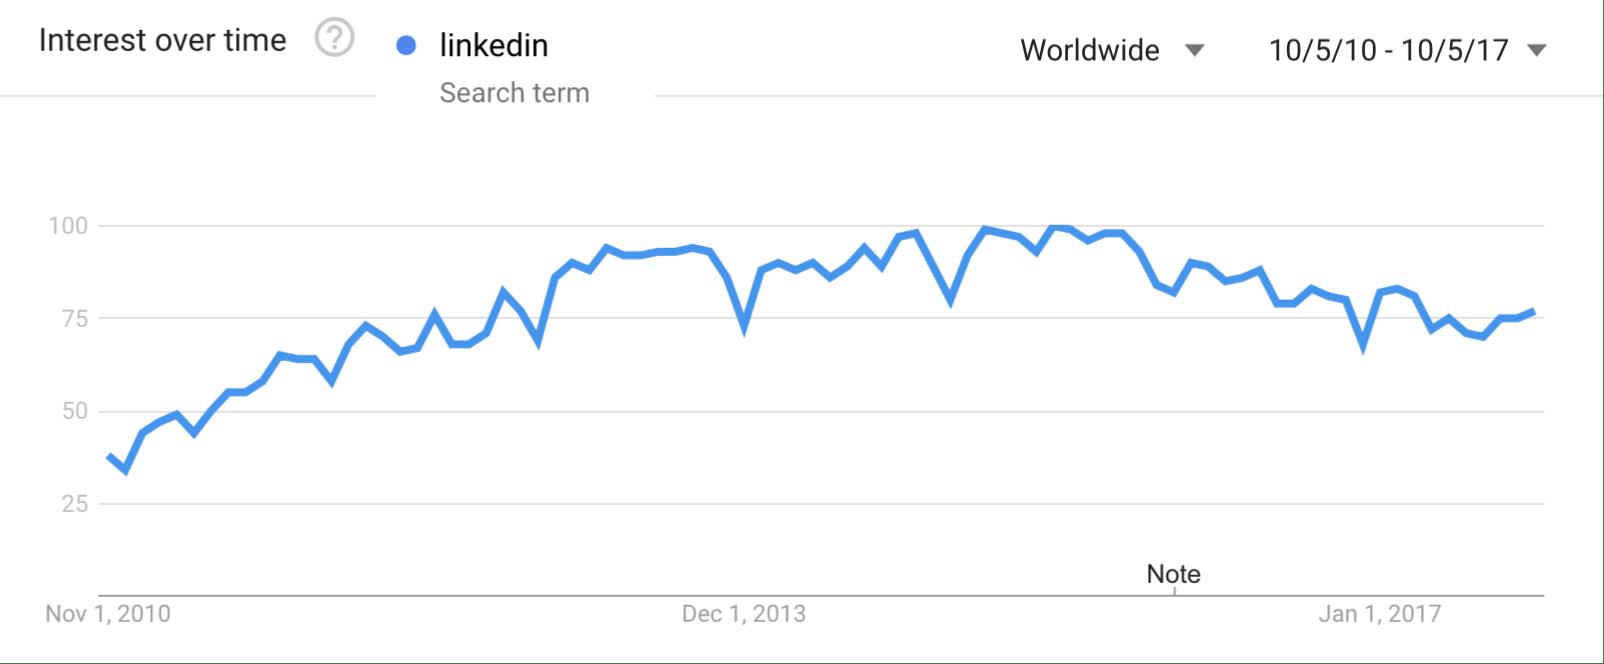 Tendances de recherche Google - LinkedIn